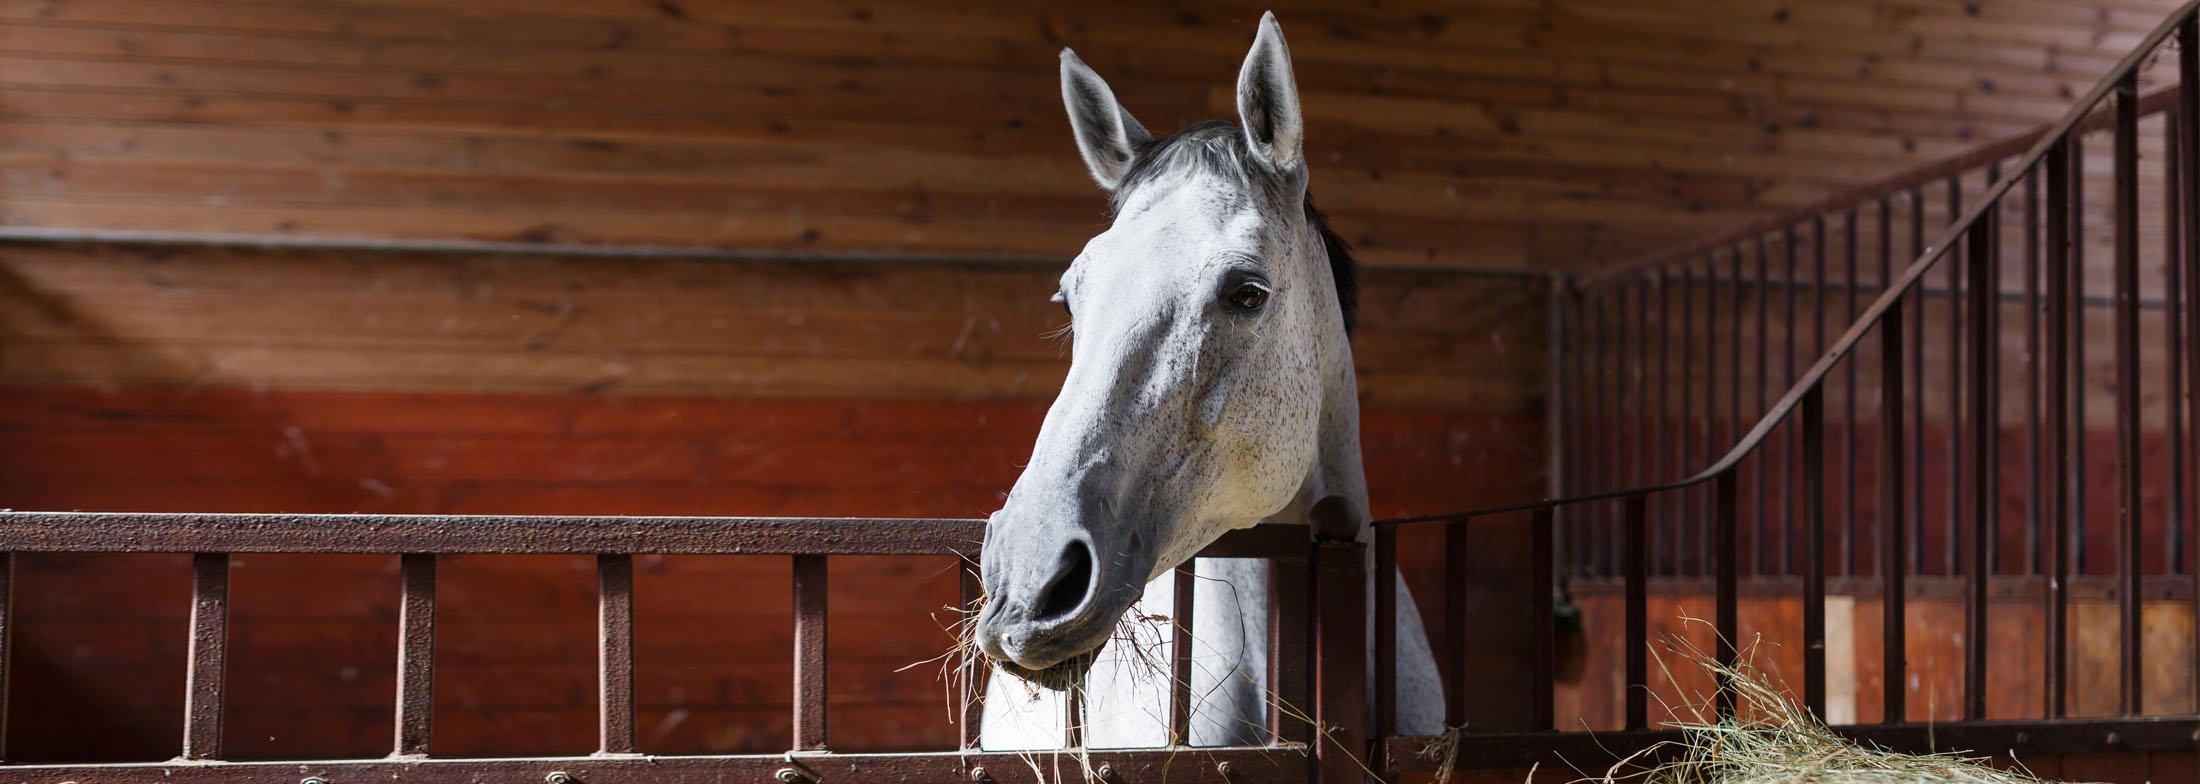 equineslider6-1